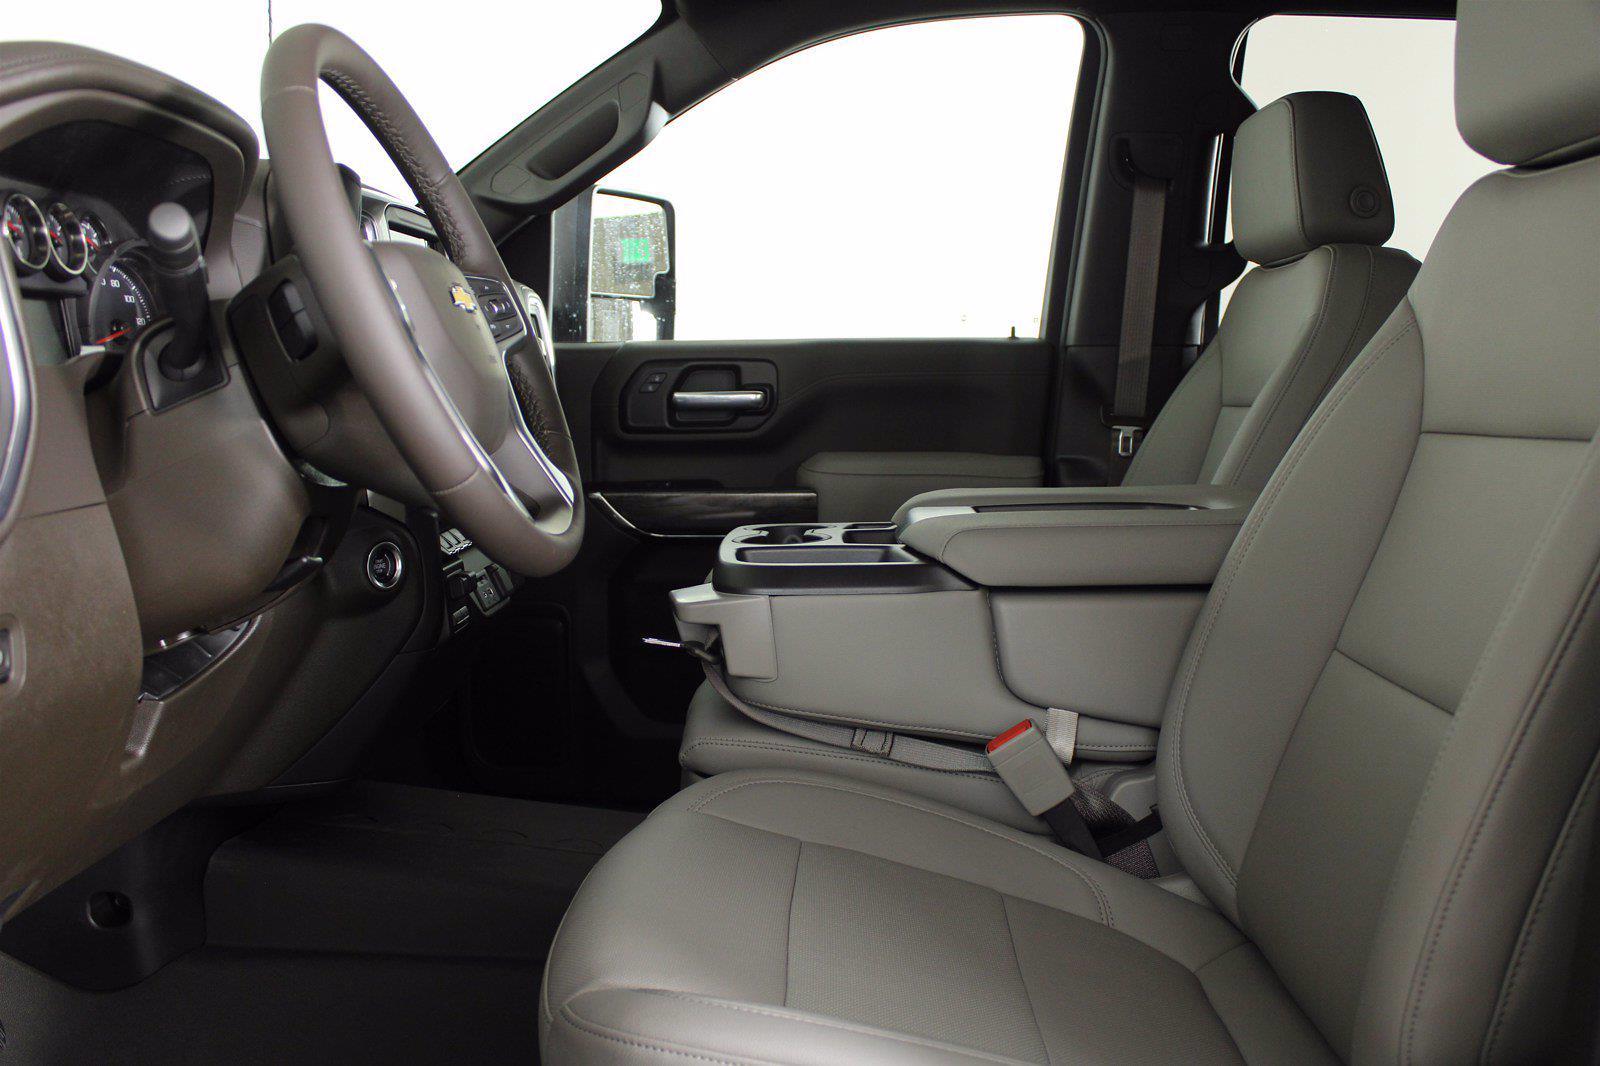 2021 Chevrolet Silverado 2500 Crew Cab 4x4, Pickup #D111097 - photo 14